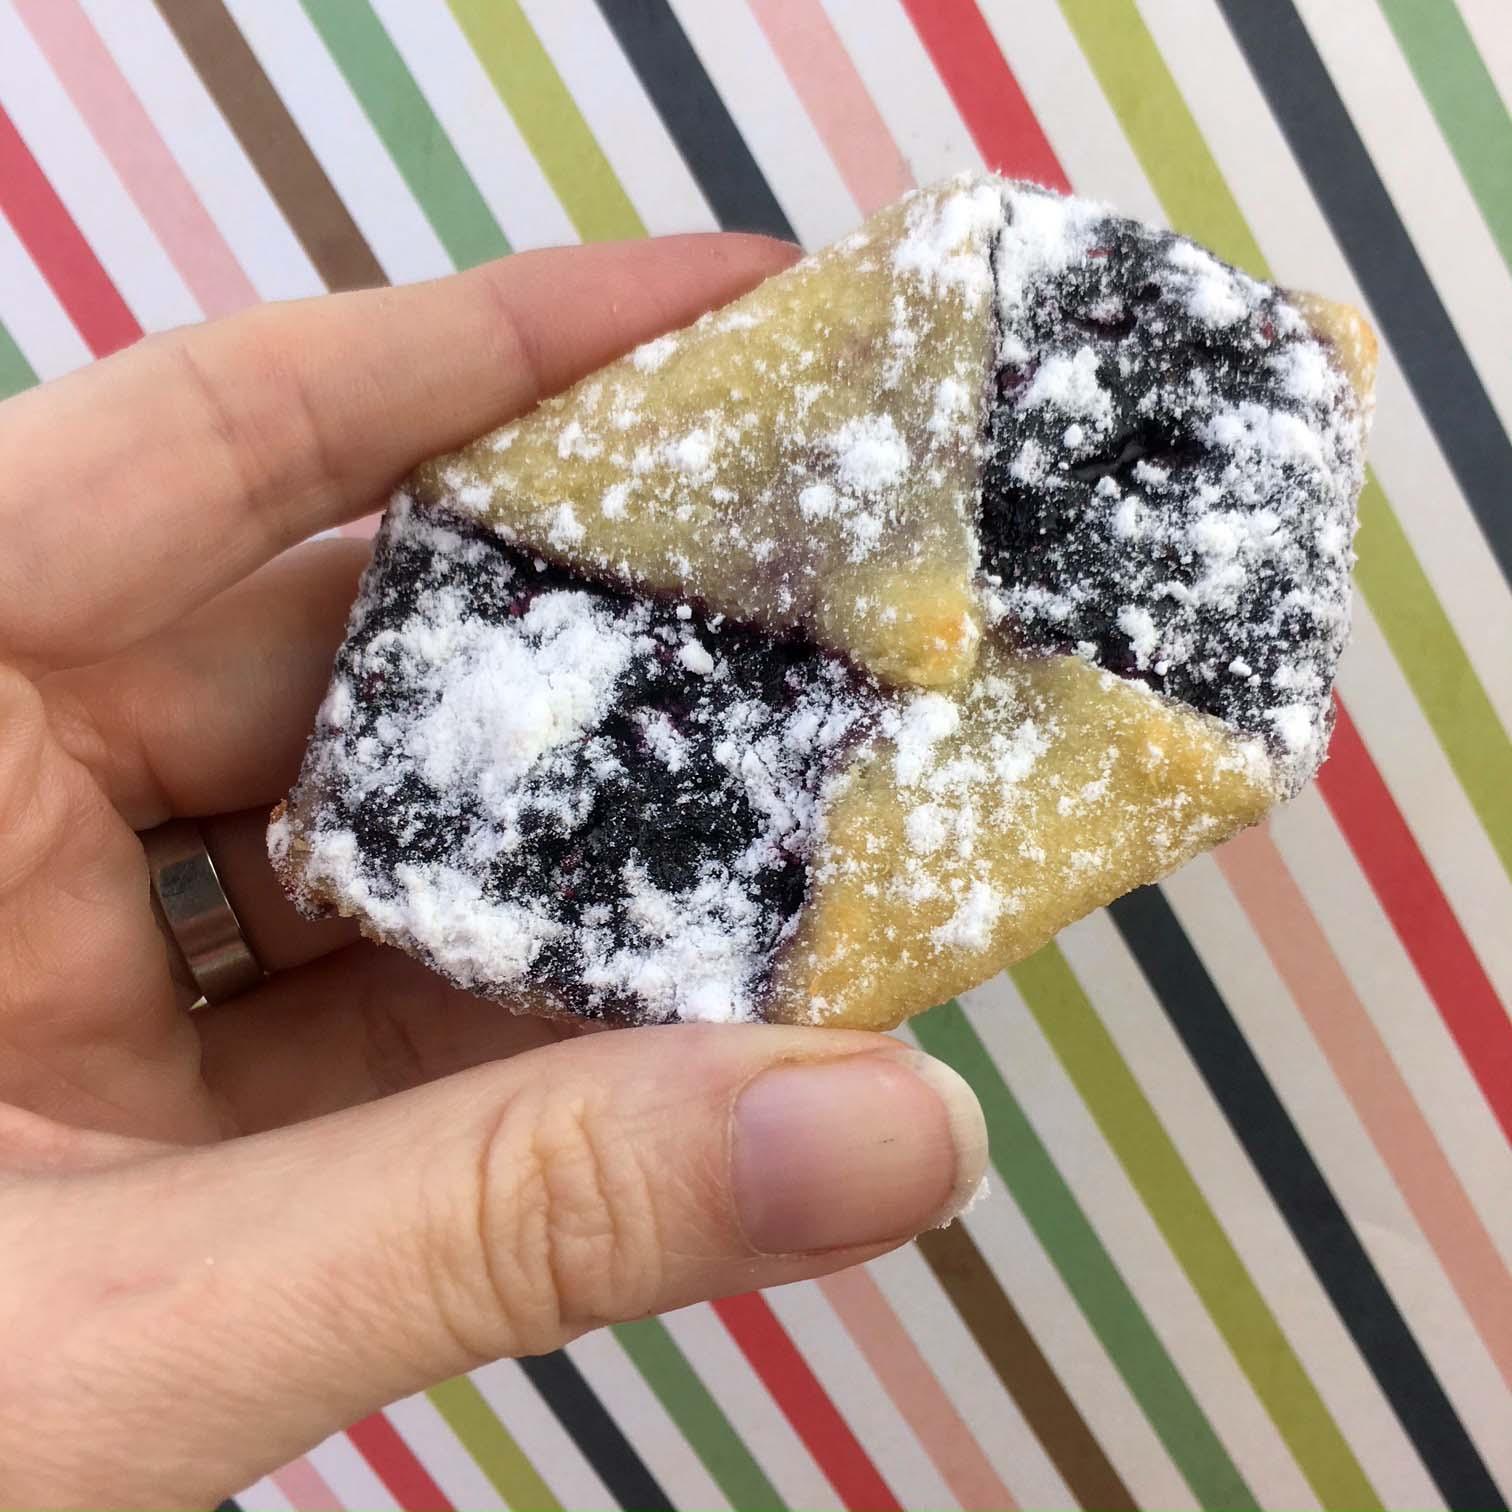 Low Carb Keto Grain Free Gluten Free Fruit Filled Cookie Recipe